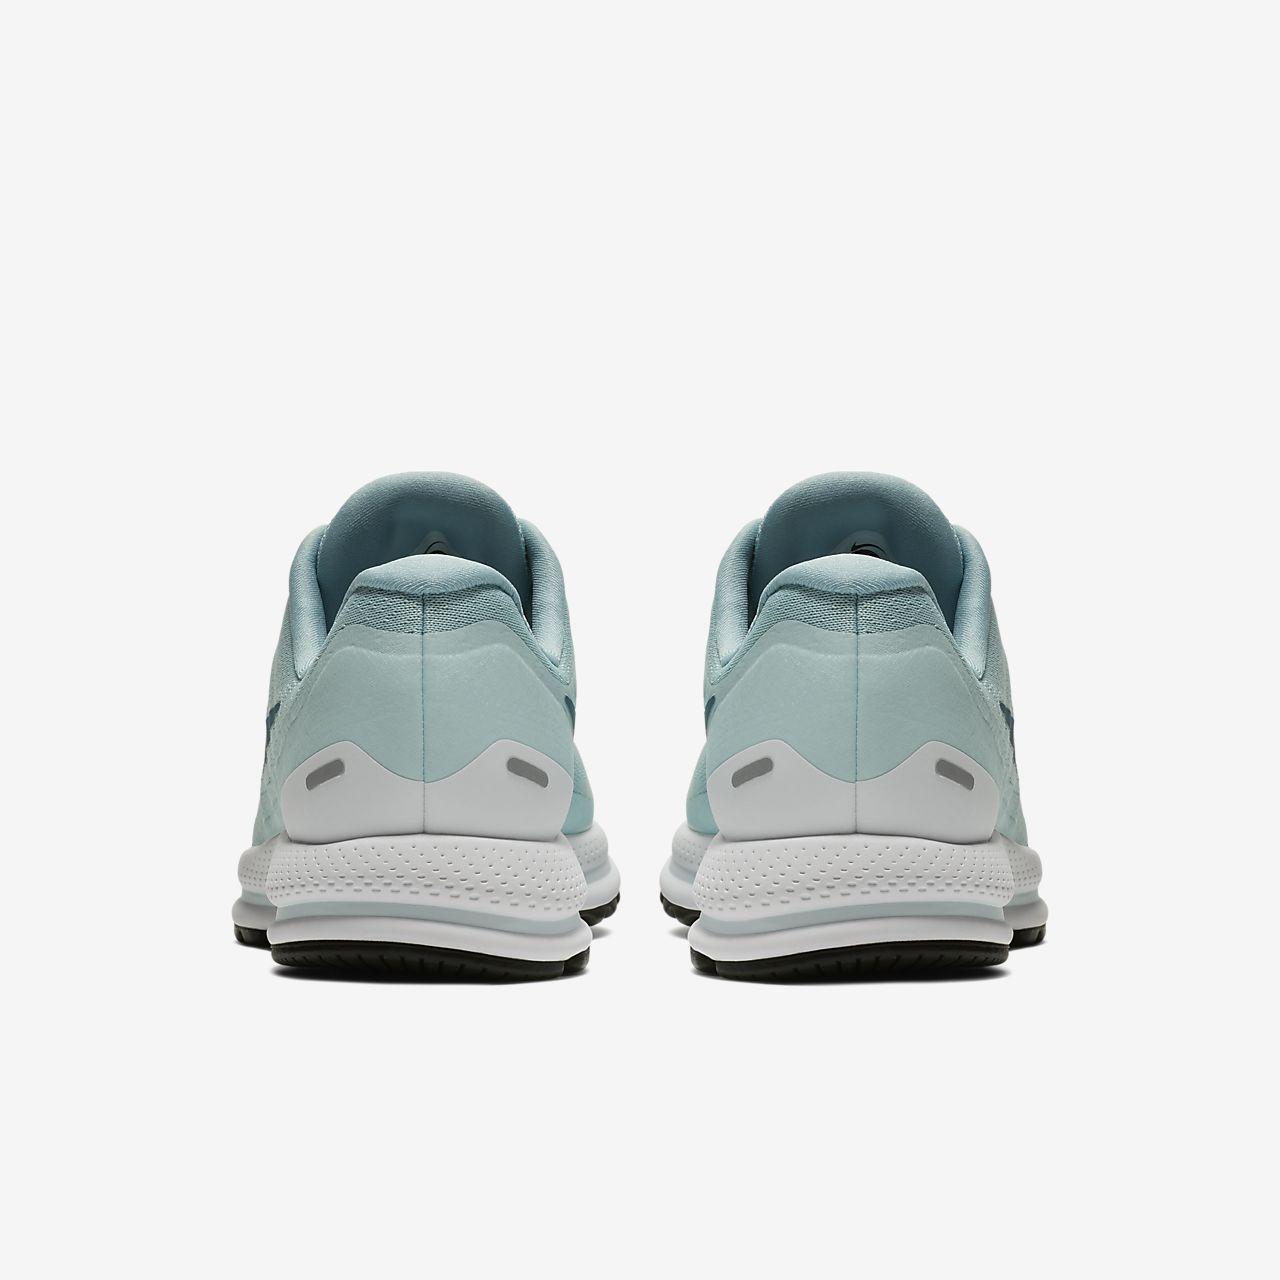 01a8e28093fed Nike Air Zoom Vomero 13 Women s Running Shoe. Nike.com GB